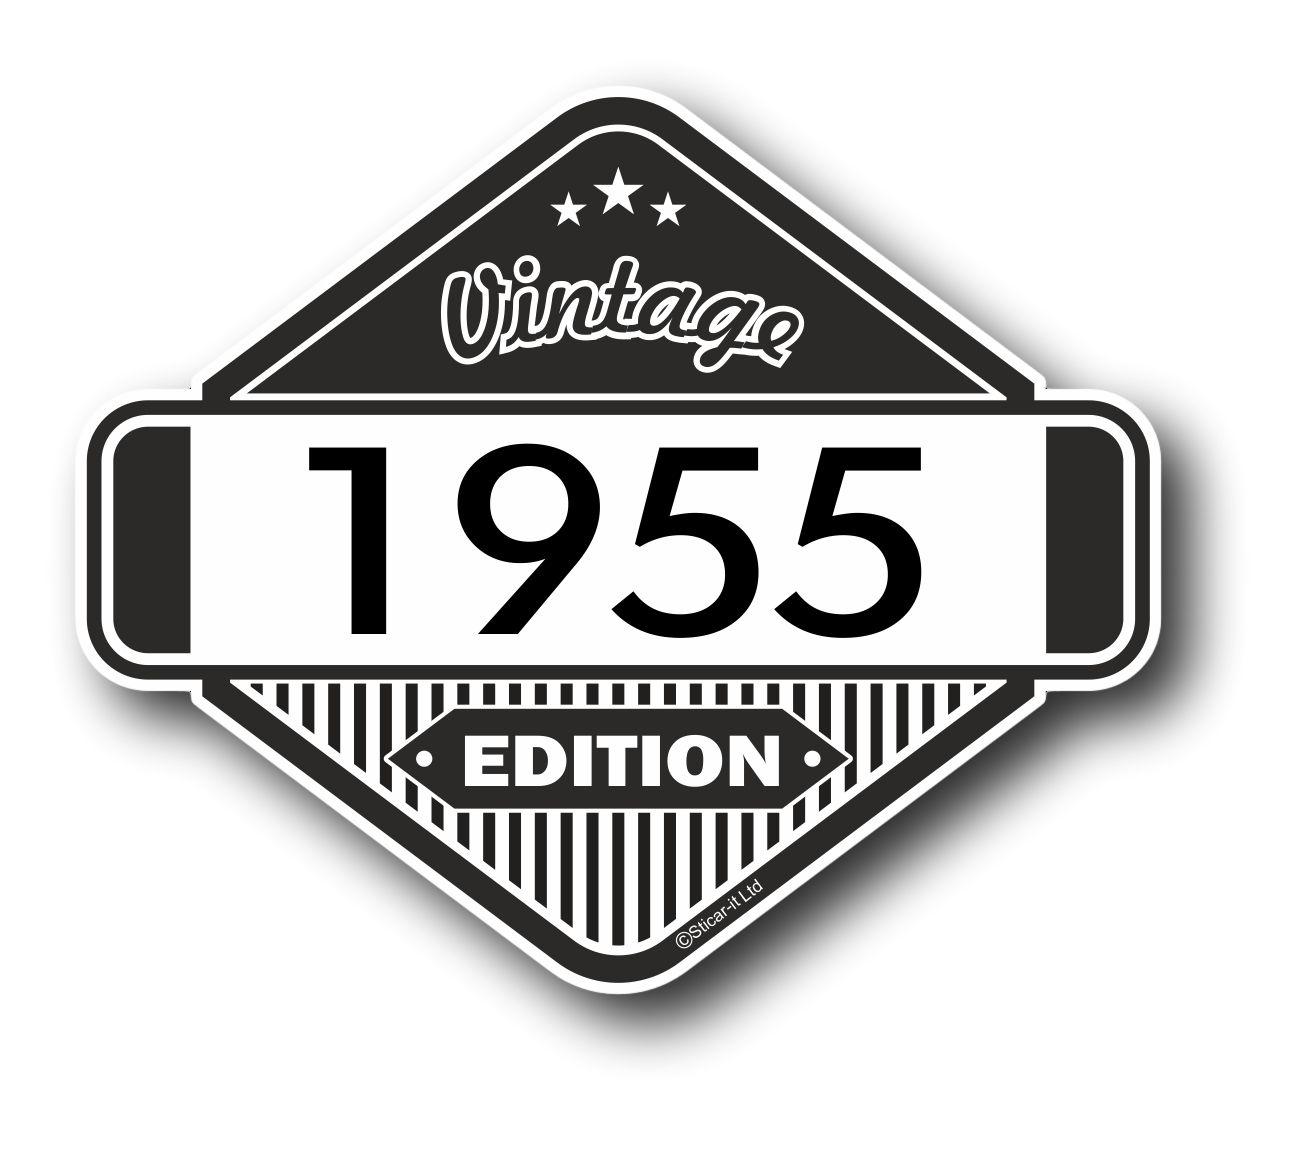 Vintage Edition 1955 Classic Retro Cafe Racer Design External Vinyl Car Motorcyle Sticker 85x70mm